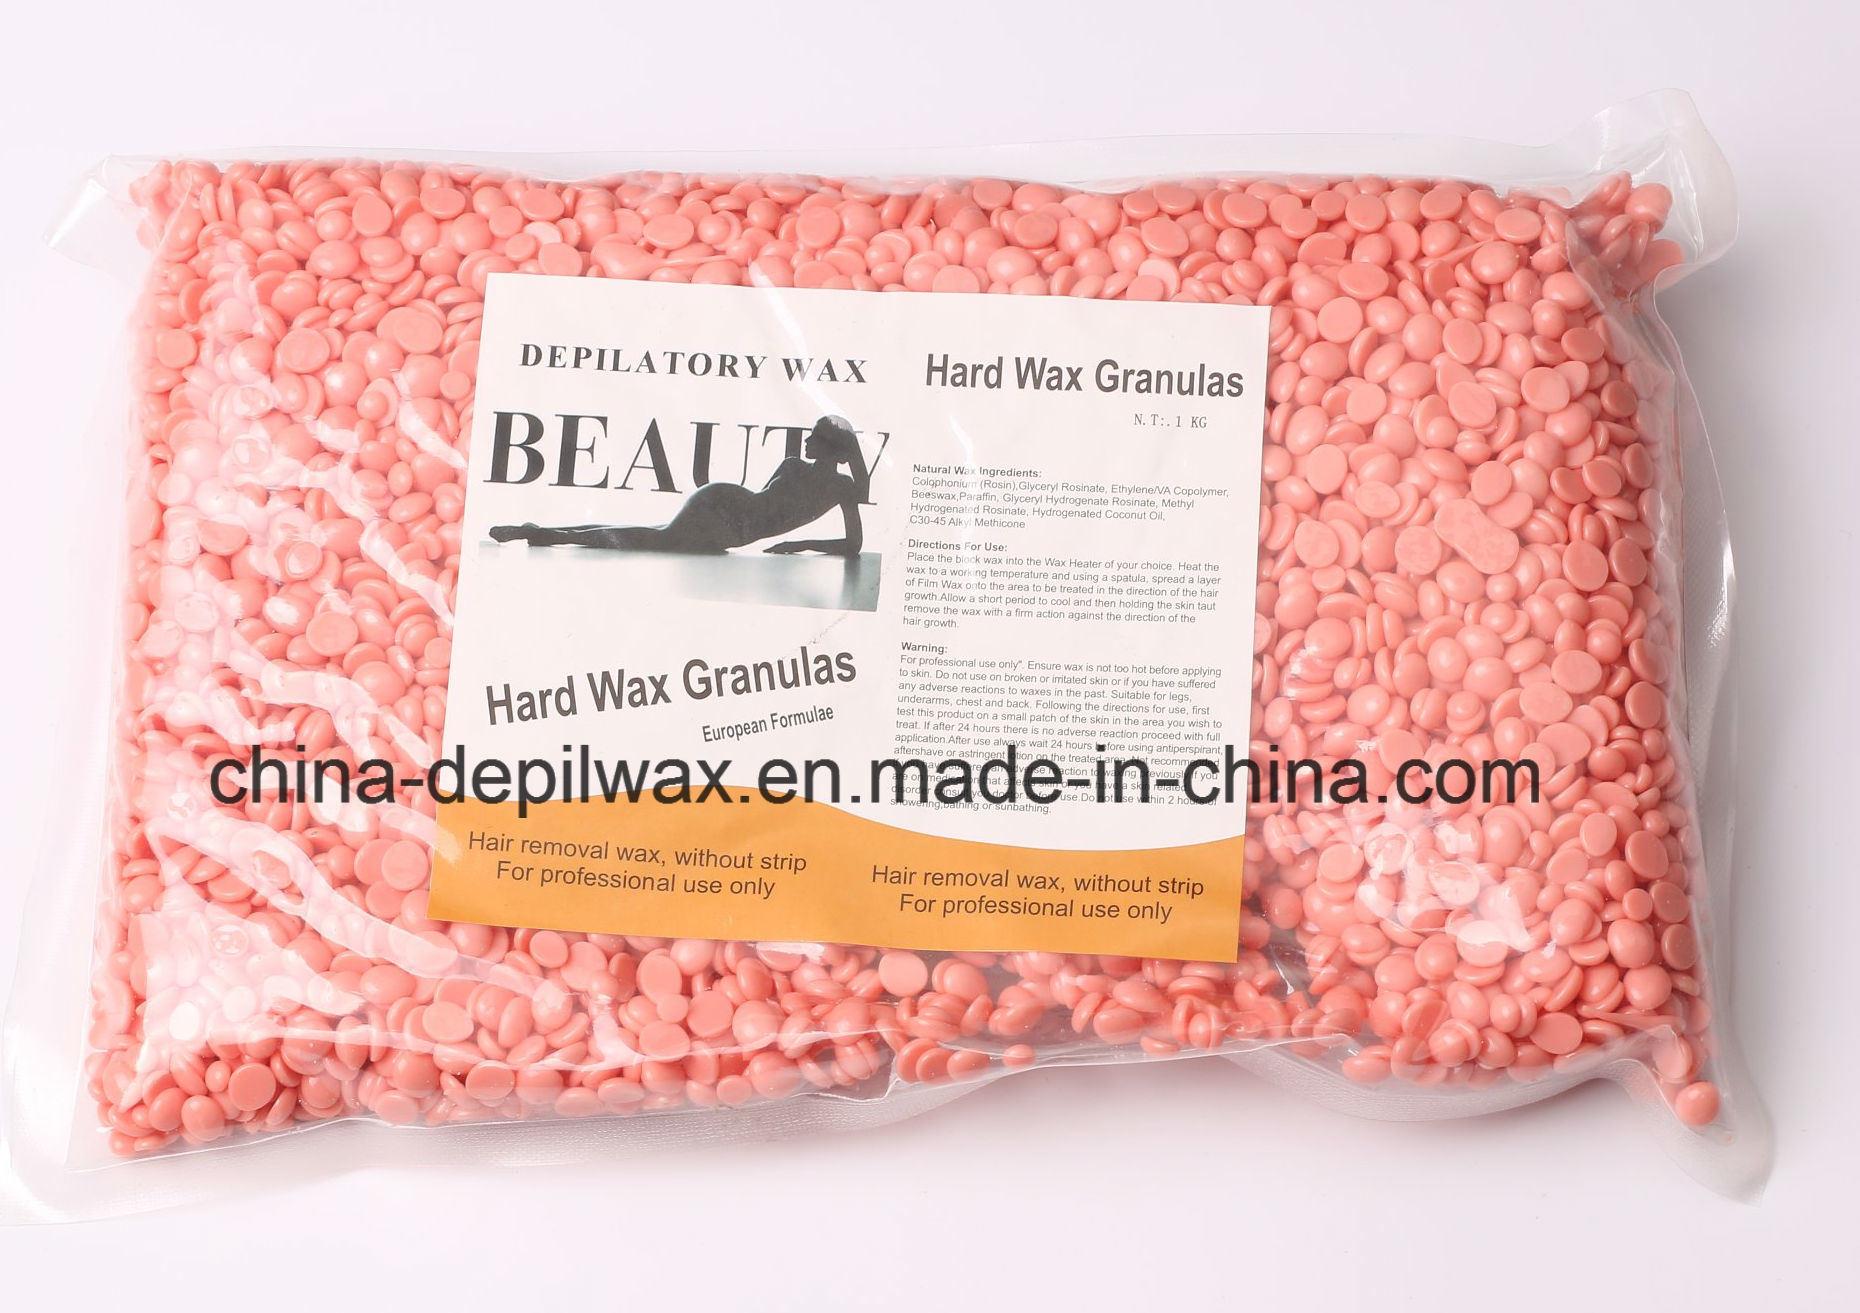 Depilatory Wax Pink Sensitive Hard Wax Pellets of Painless Waxing